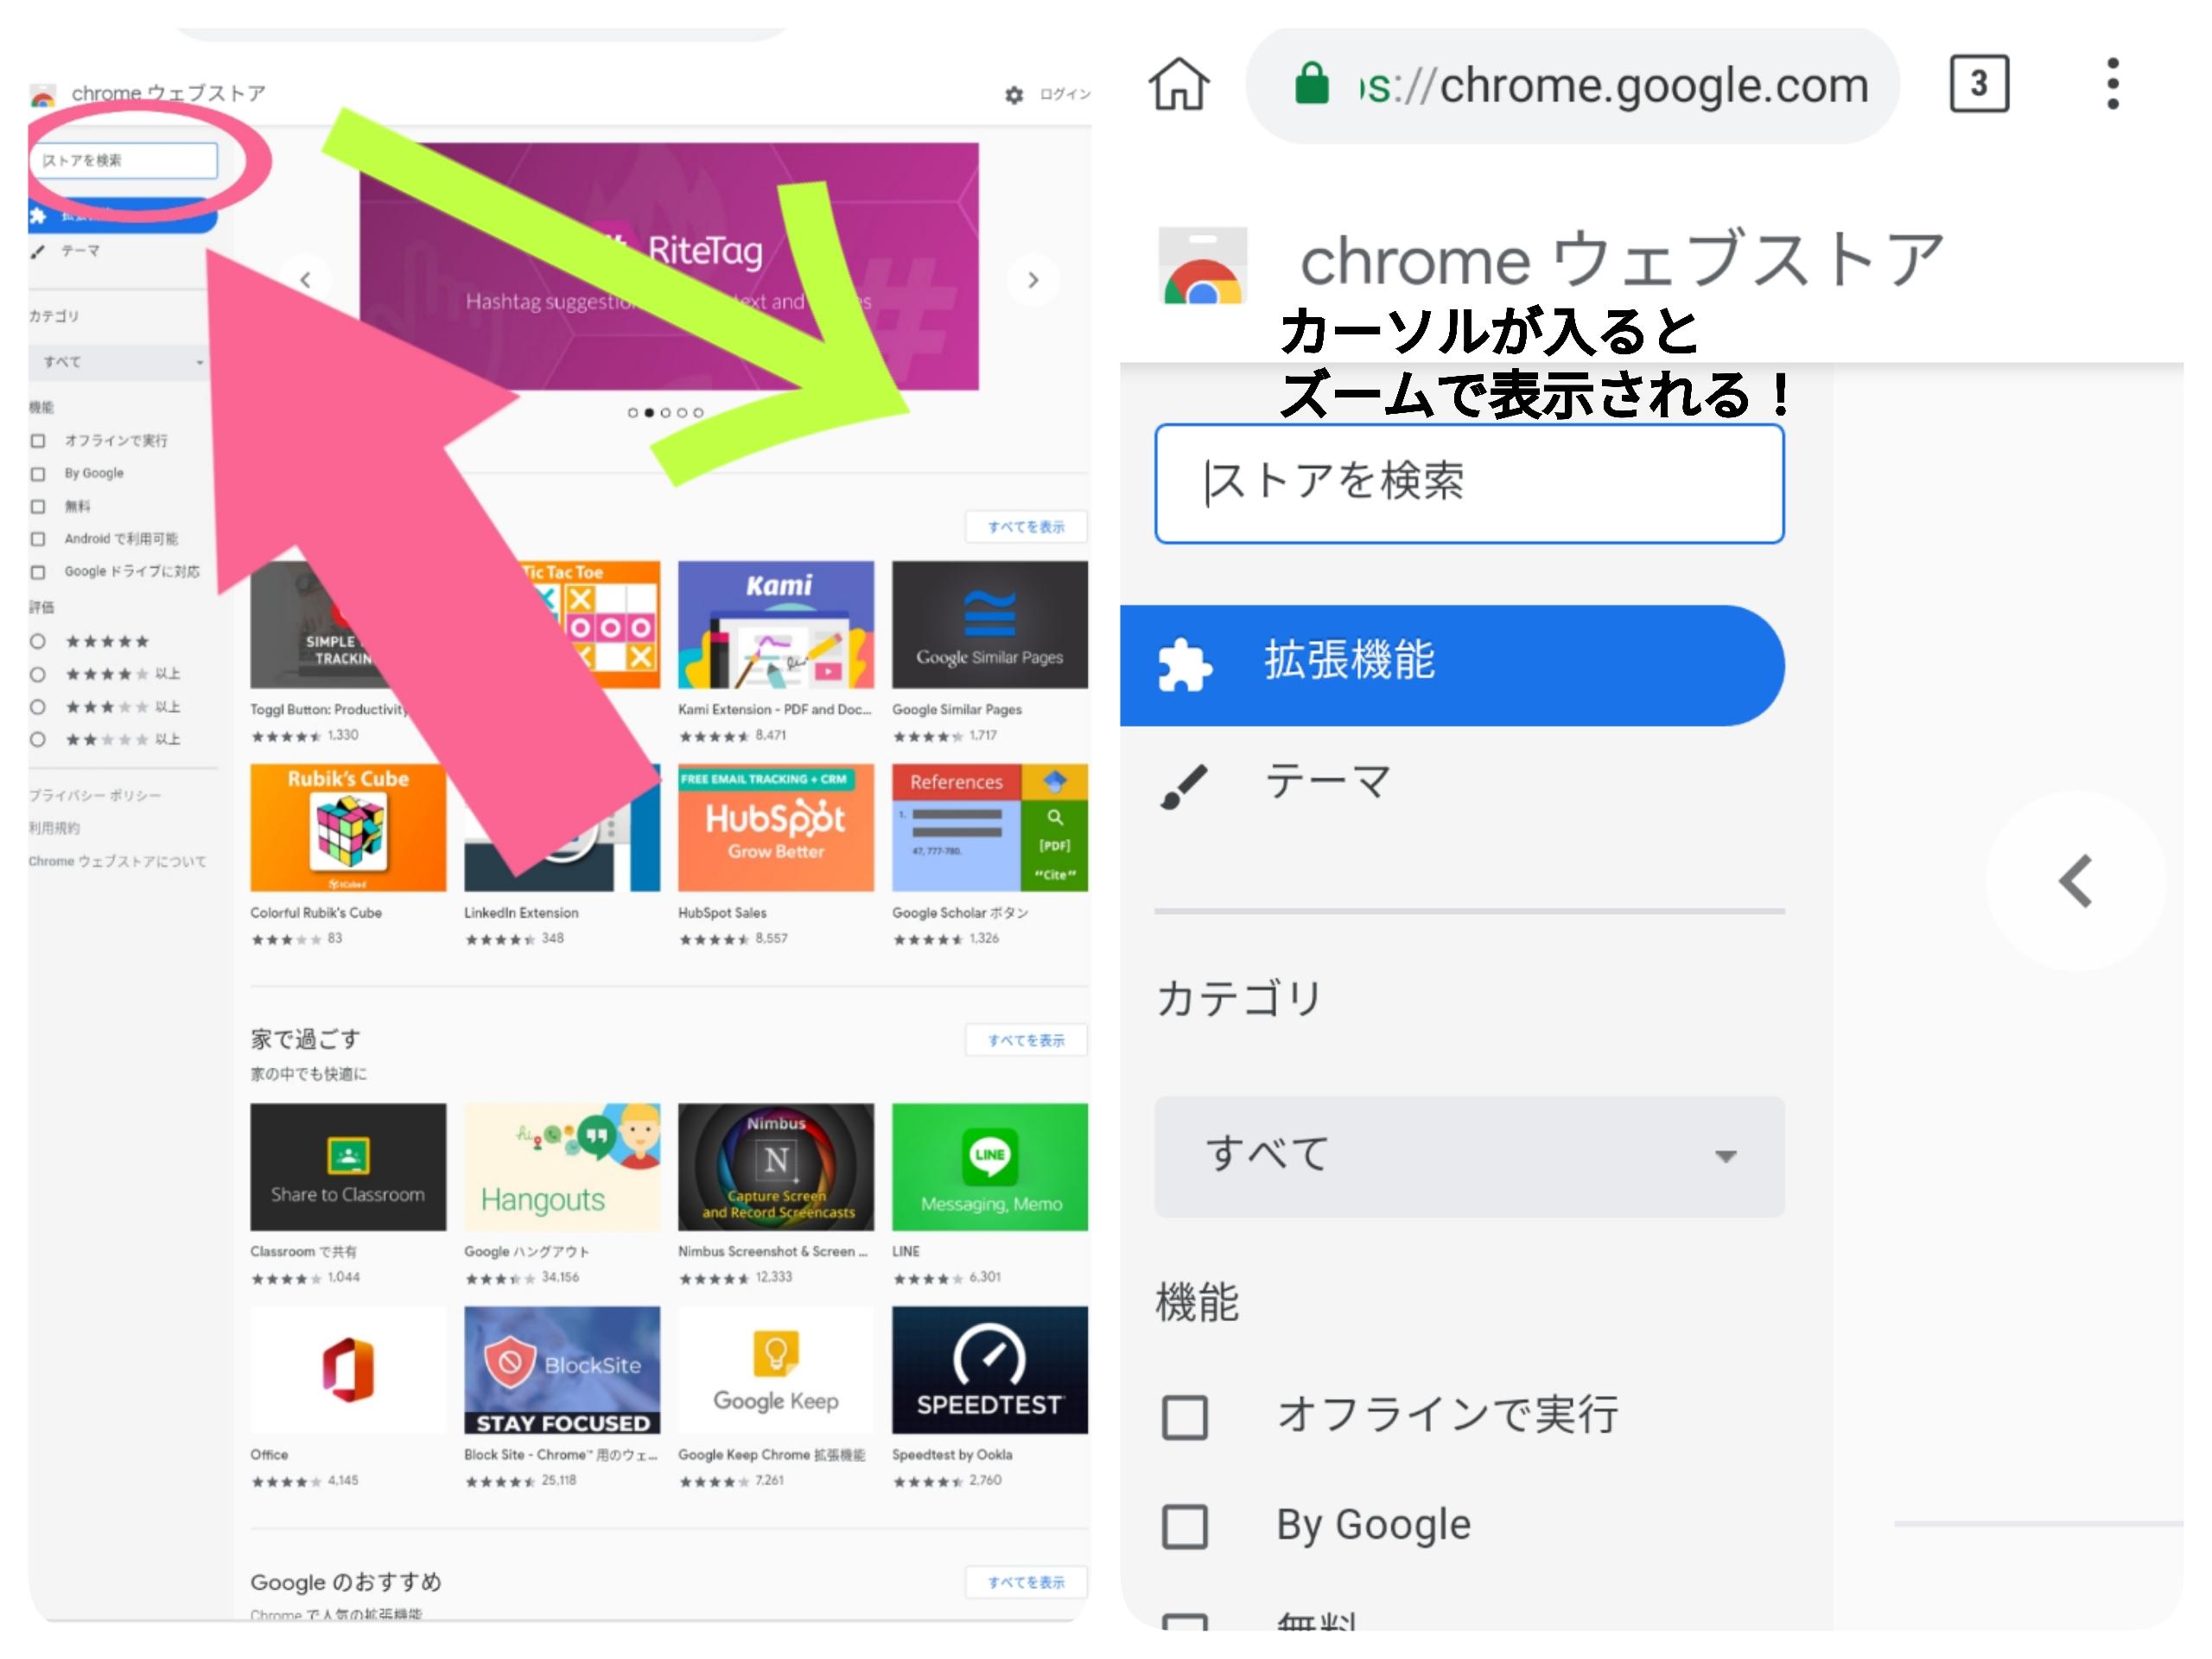 Kiwi Browser Chrome ウェブストア トップページ 左上 ストア検索 タップ 入力